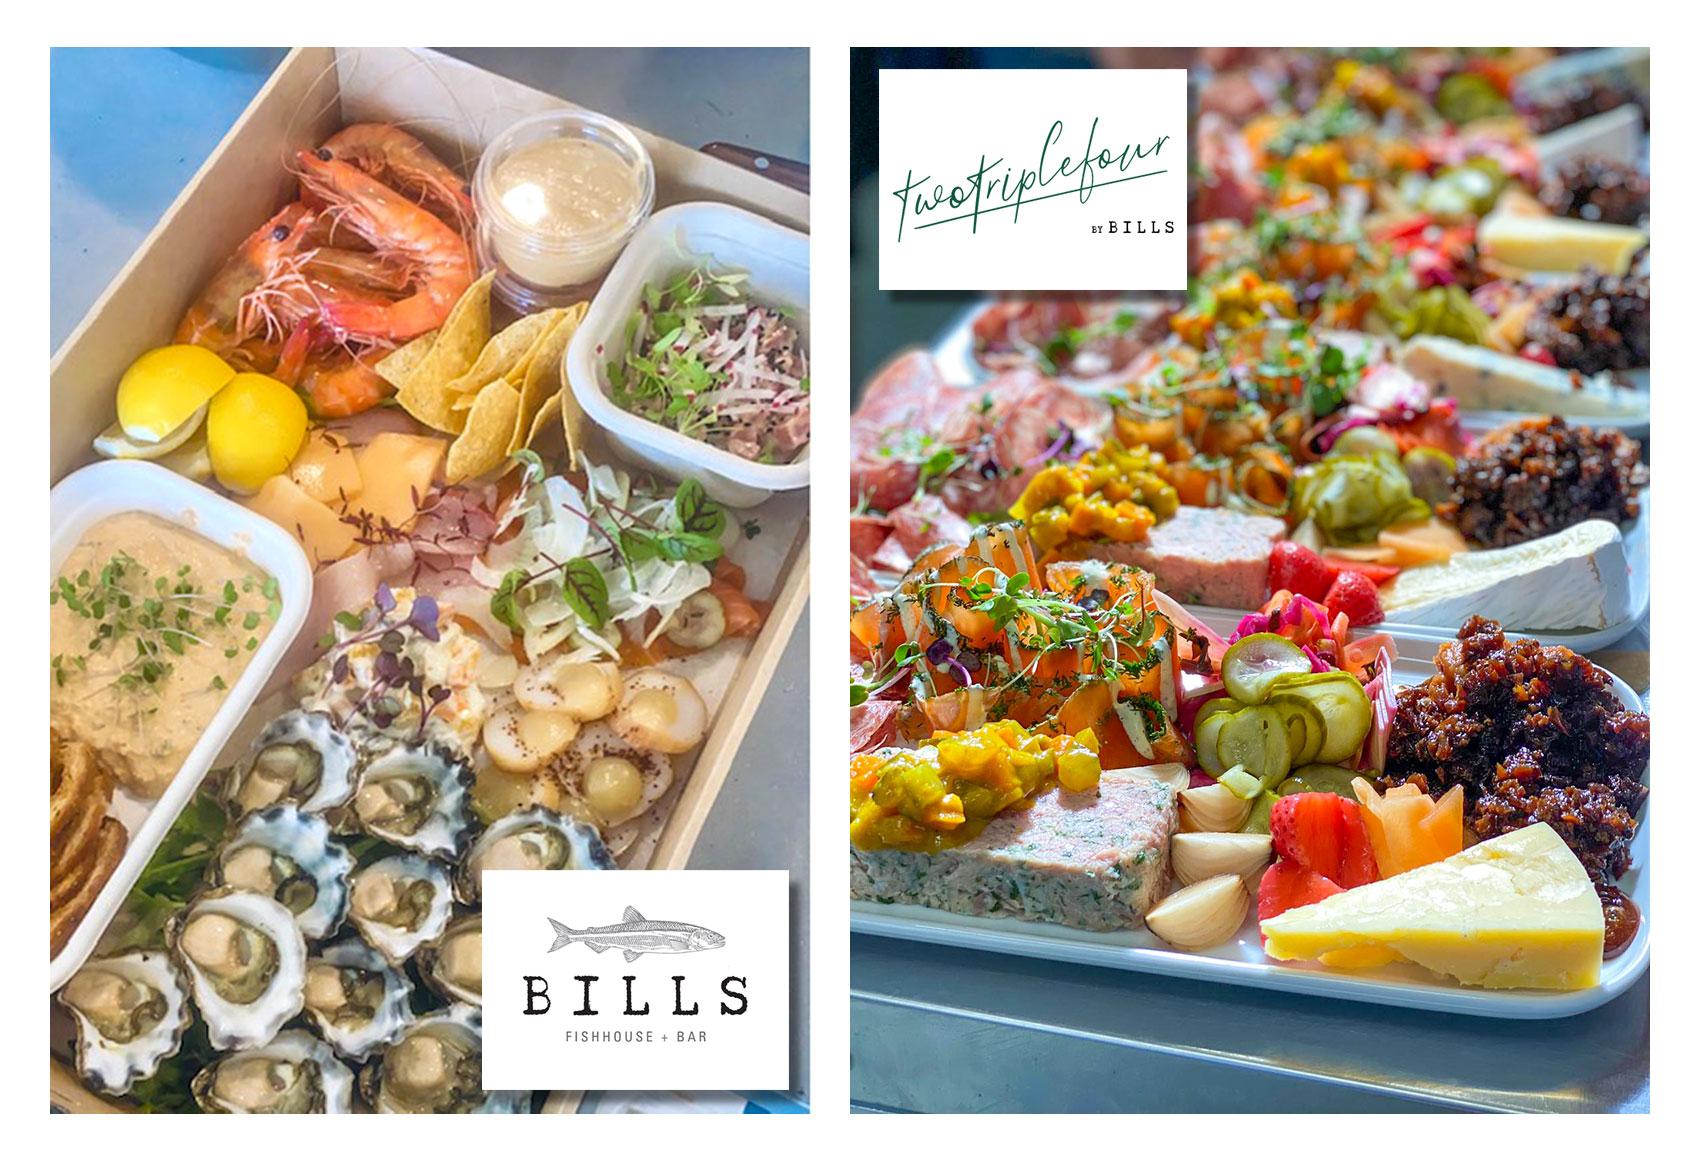 Bills-Fishhouse-Seafood-Platter